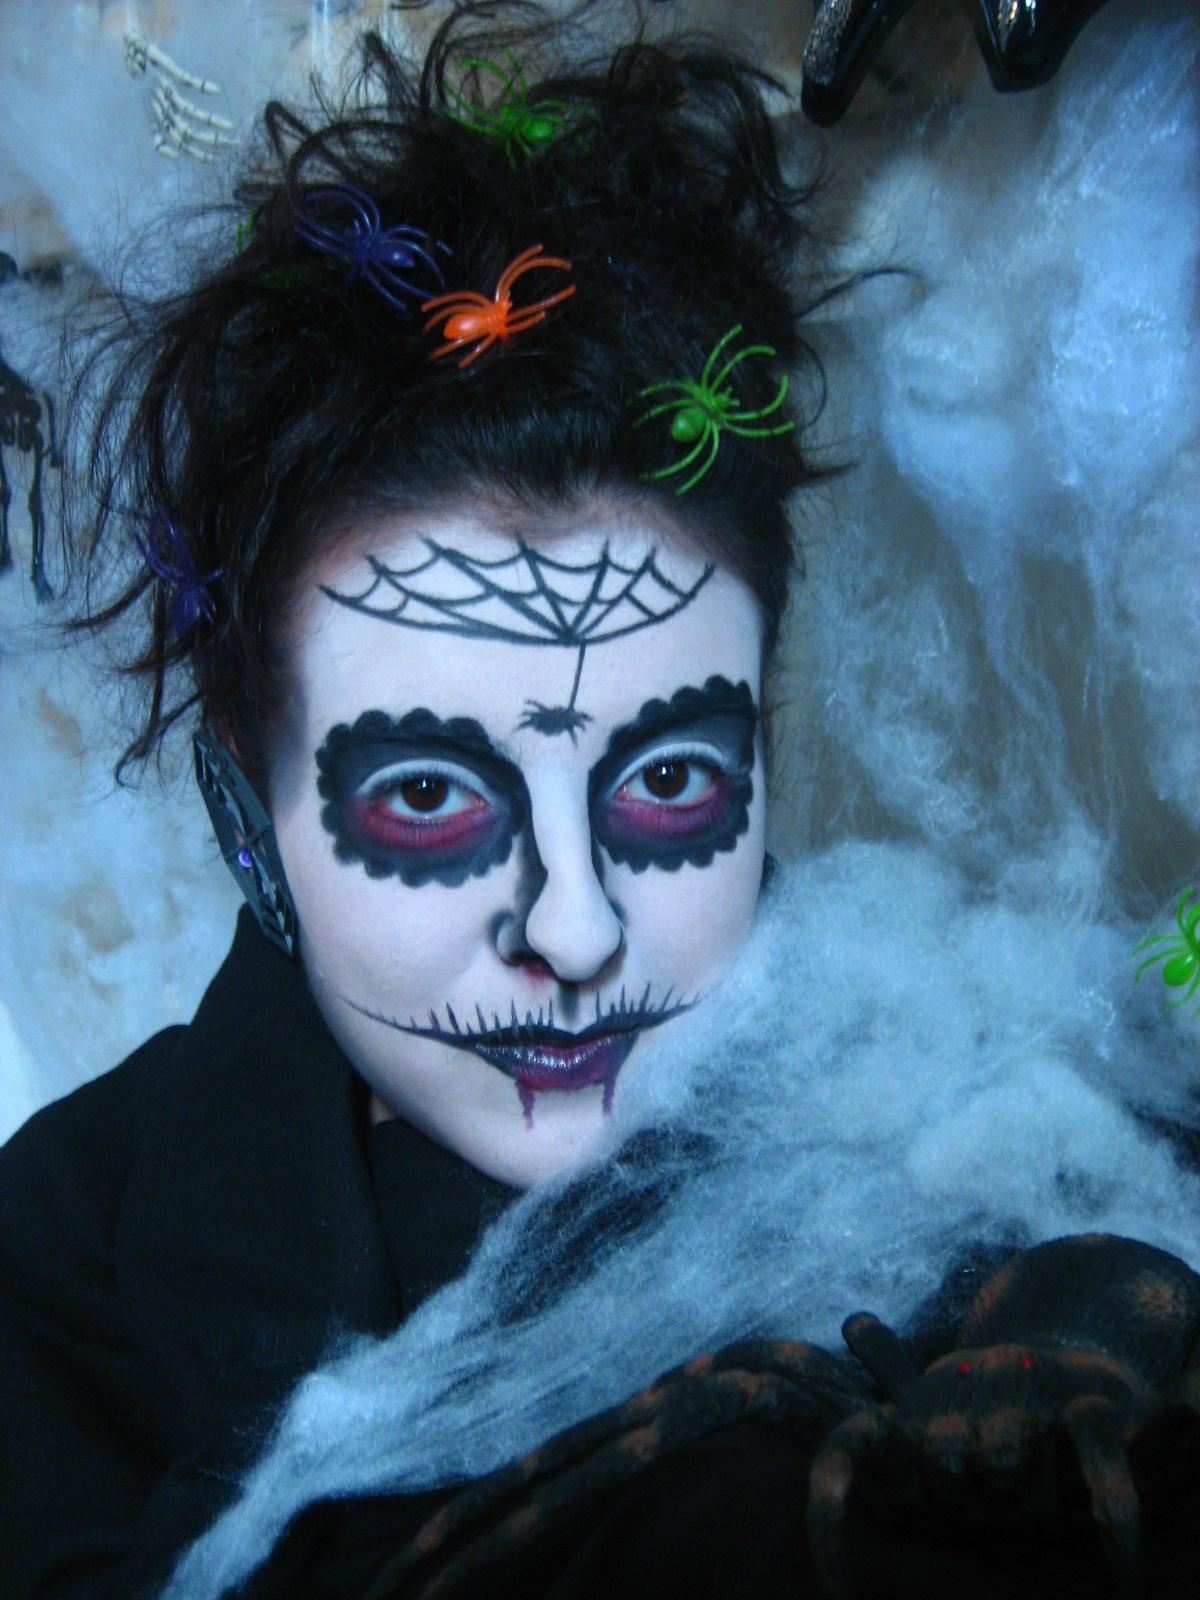 Maquillage Sorciere Pour Halloween